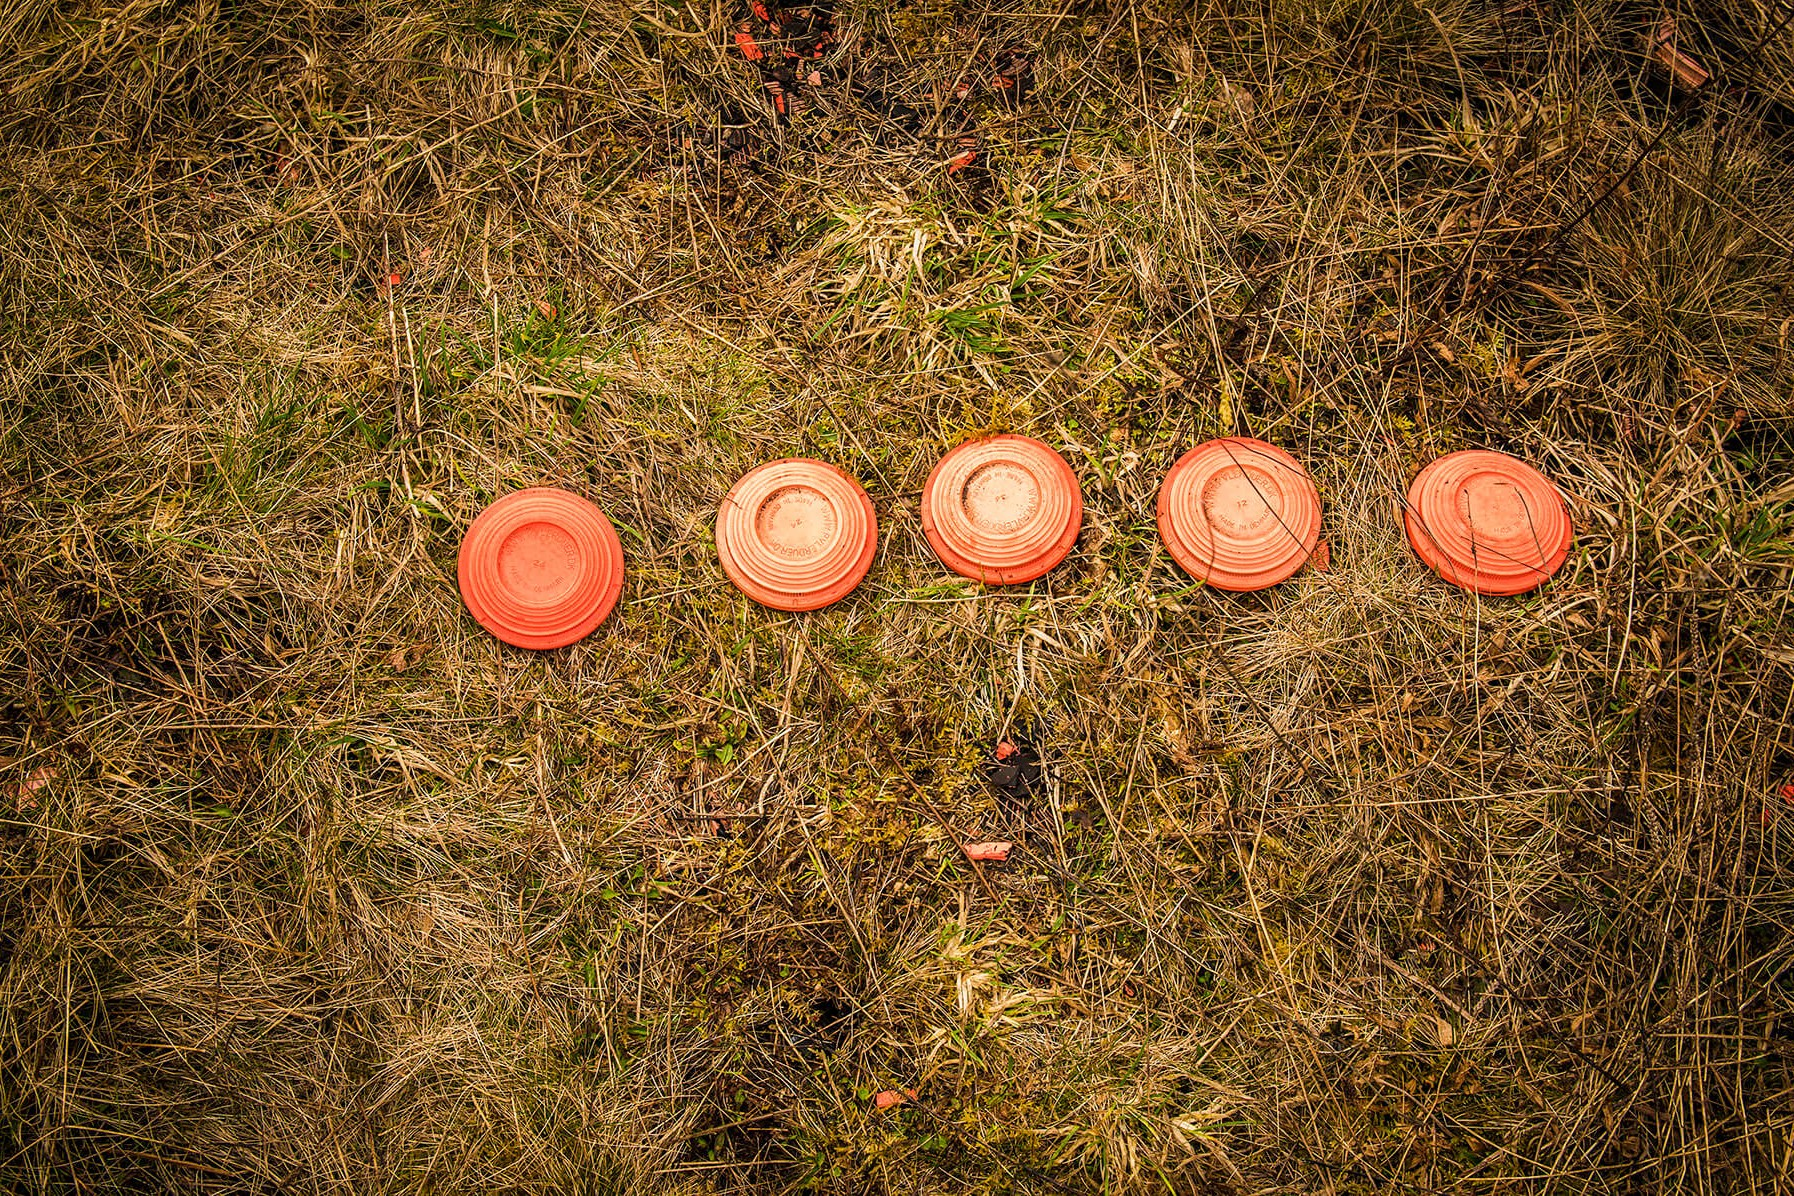 jagtskole-lerduer jagttegn jagtprøve